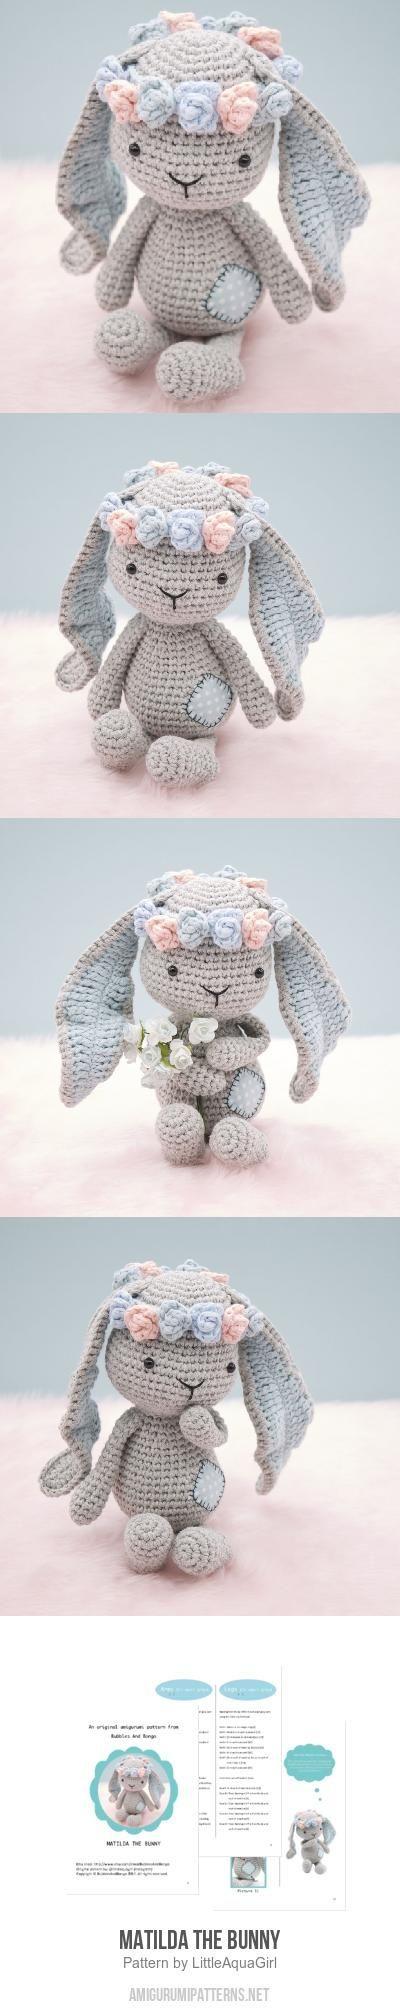 Matilda The Bunny Amigurumi Pattern